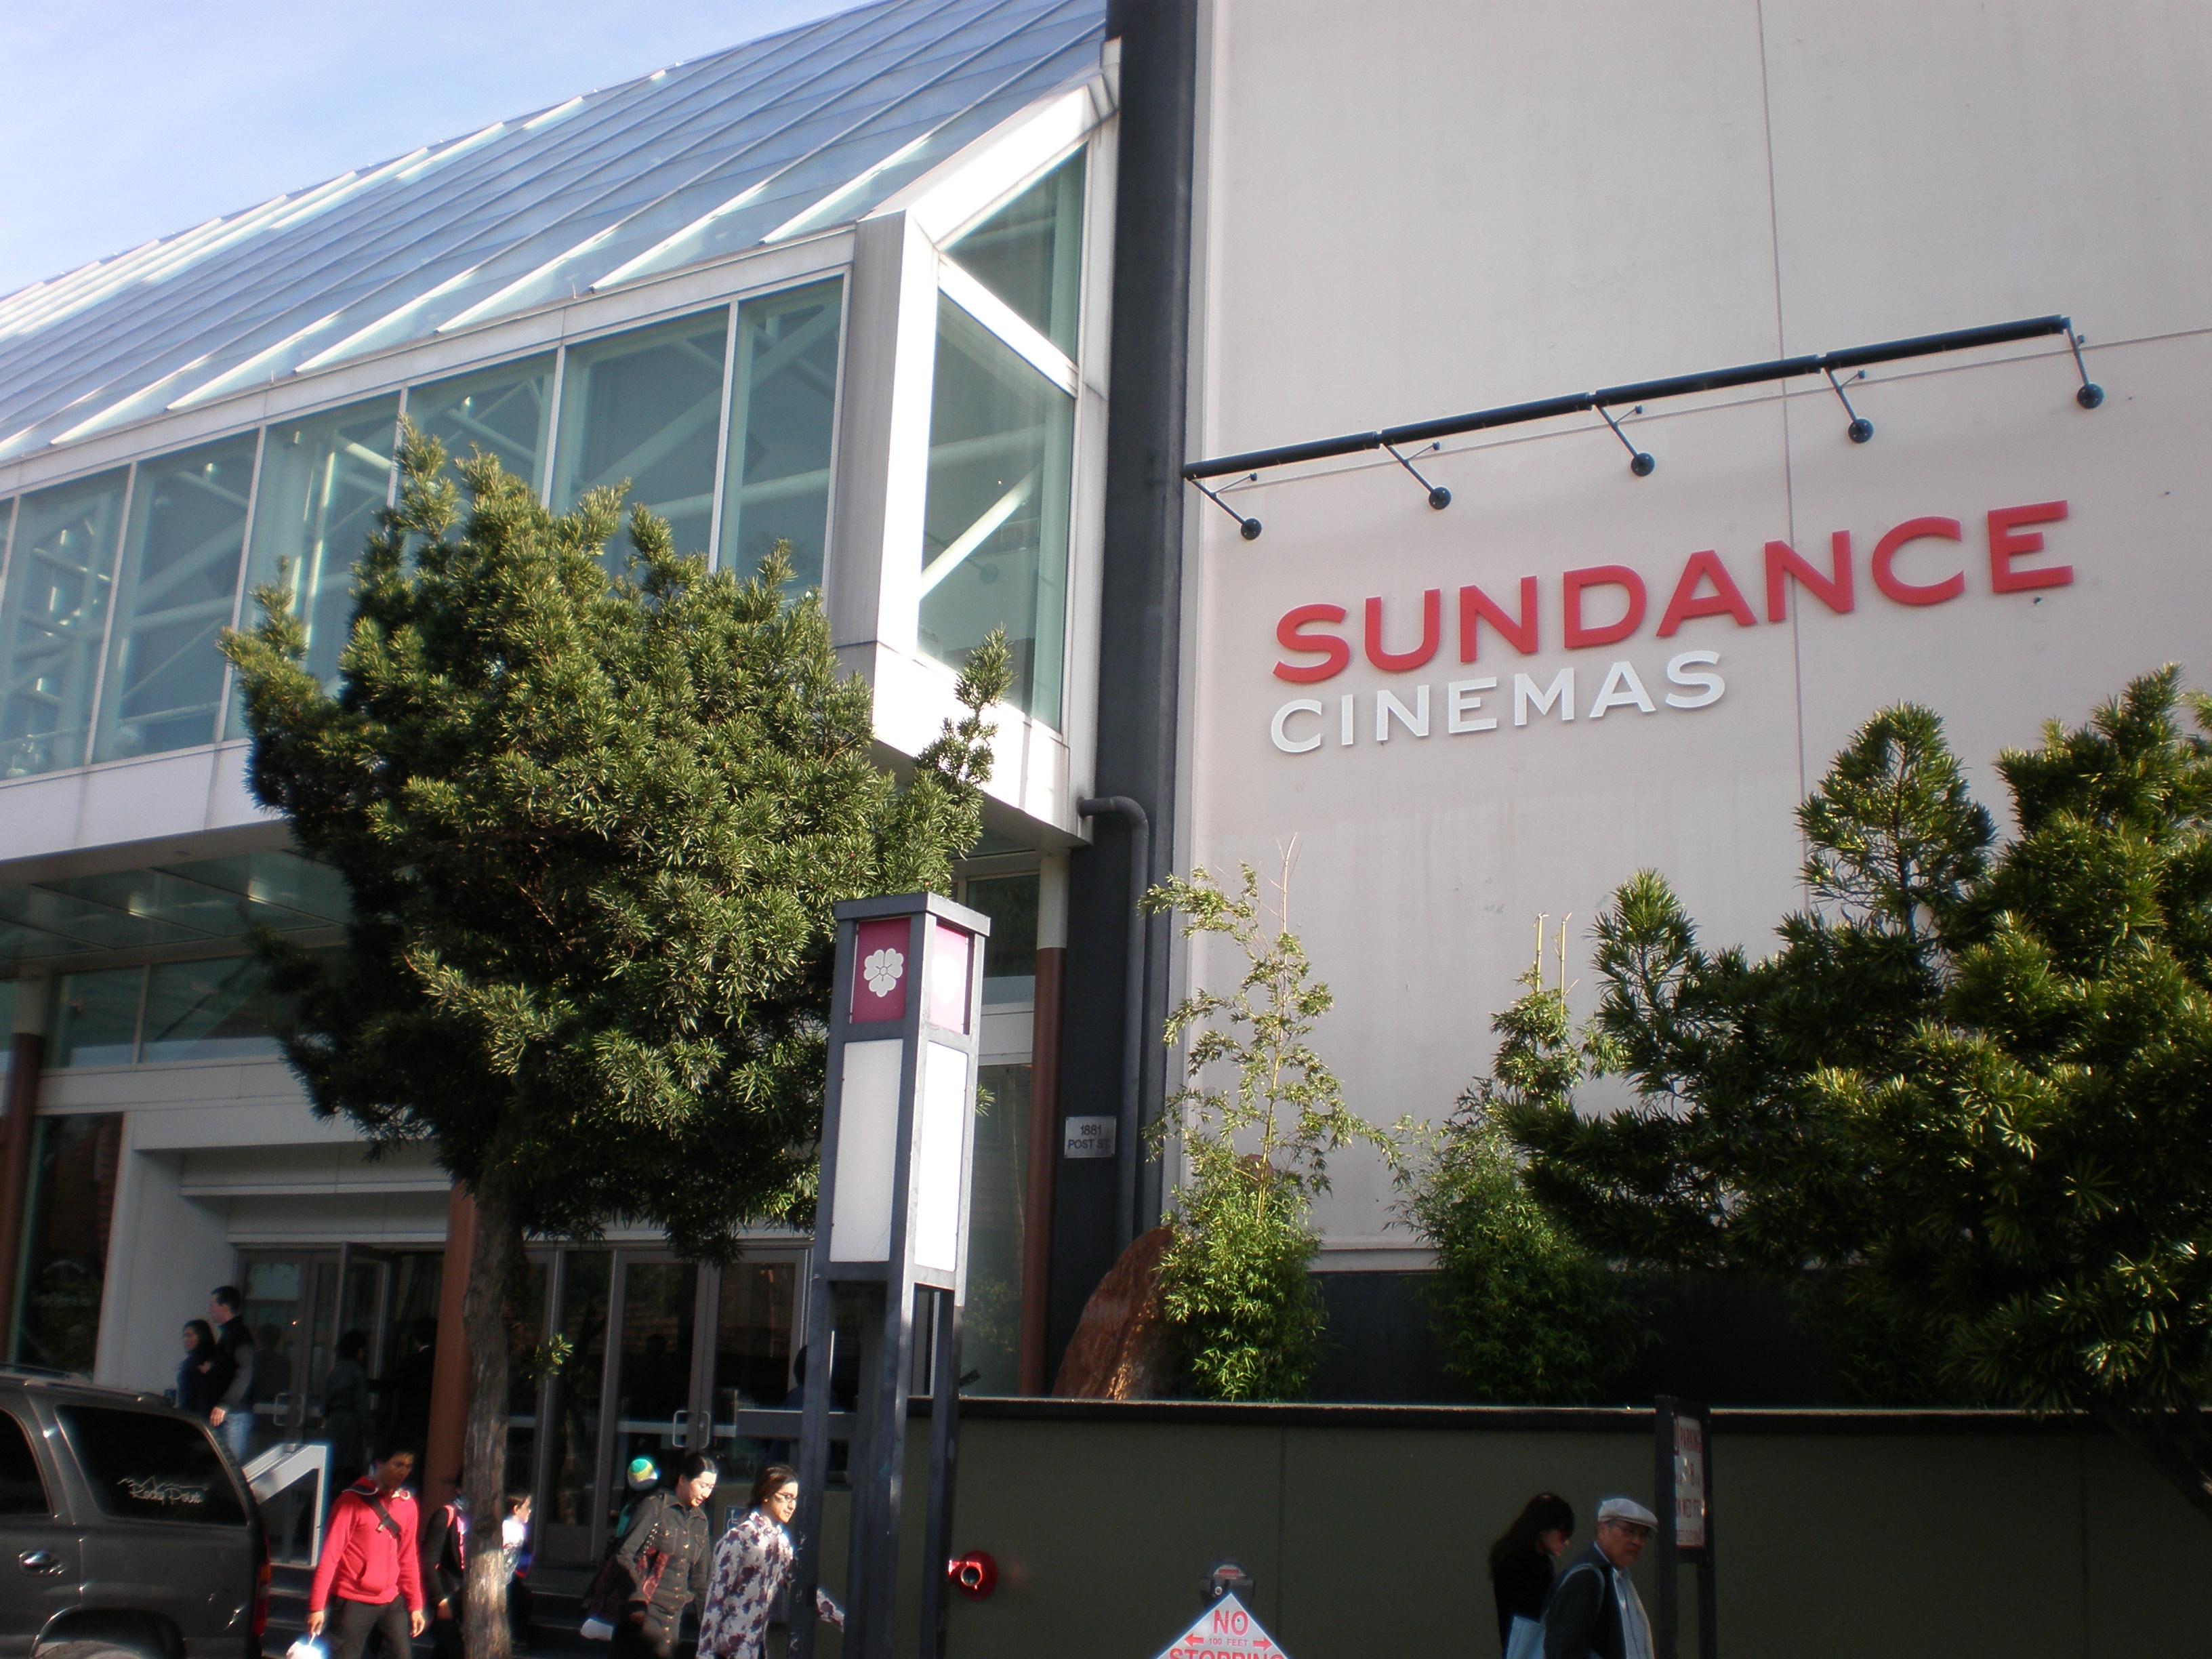 Sundance Cinemas Kabuki - Stadium Seating Enterprises